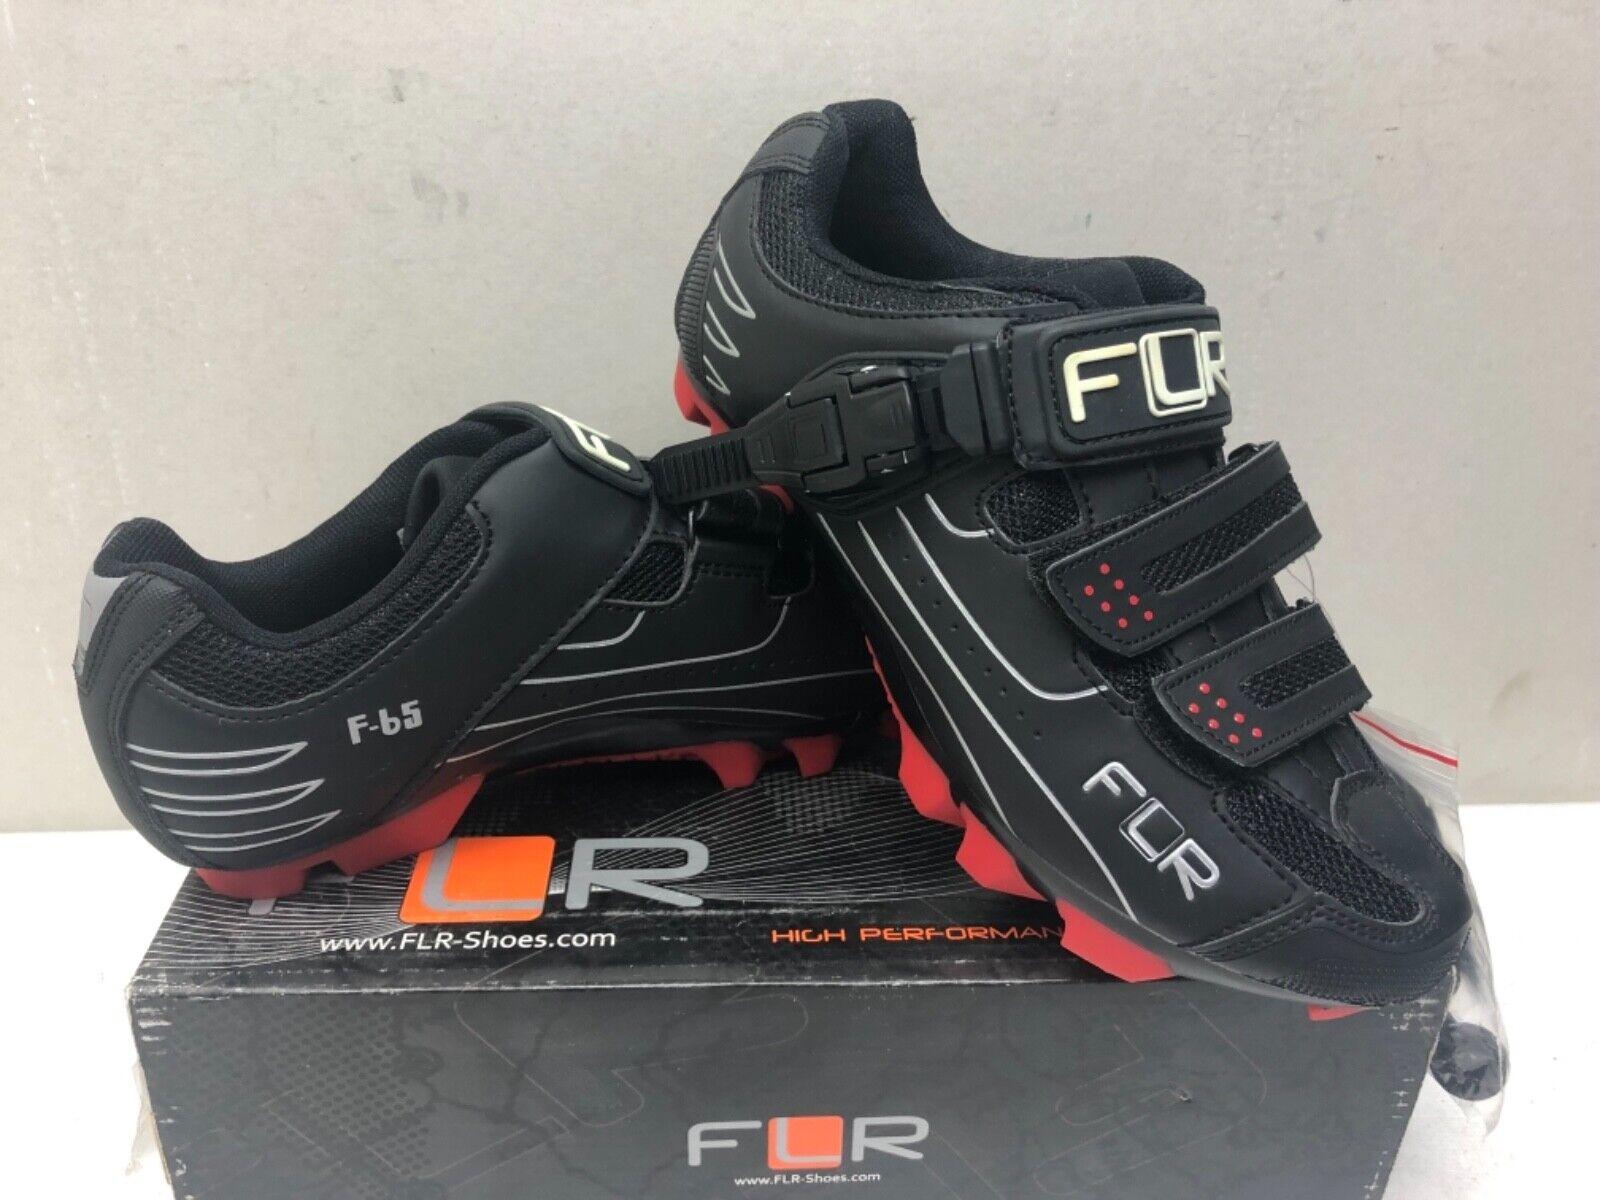 FLR F65 Scarpe MTB Ciclismo II NERO uomo WOMAN'S Taglia EU 40